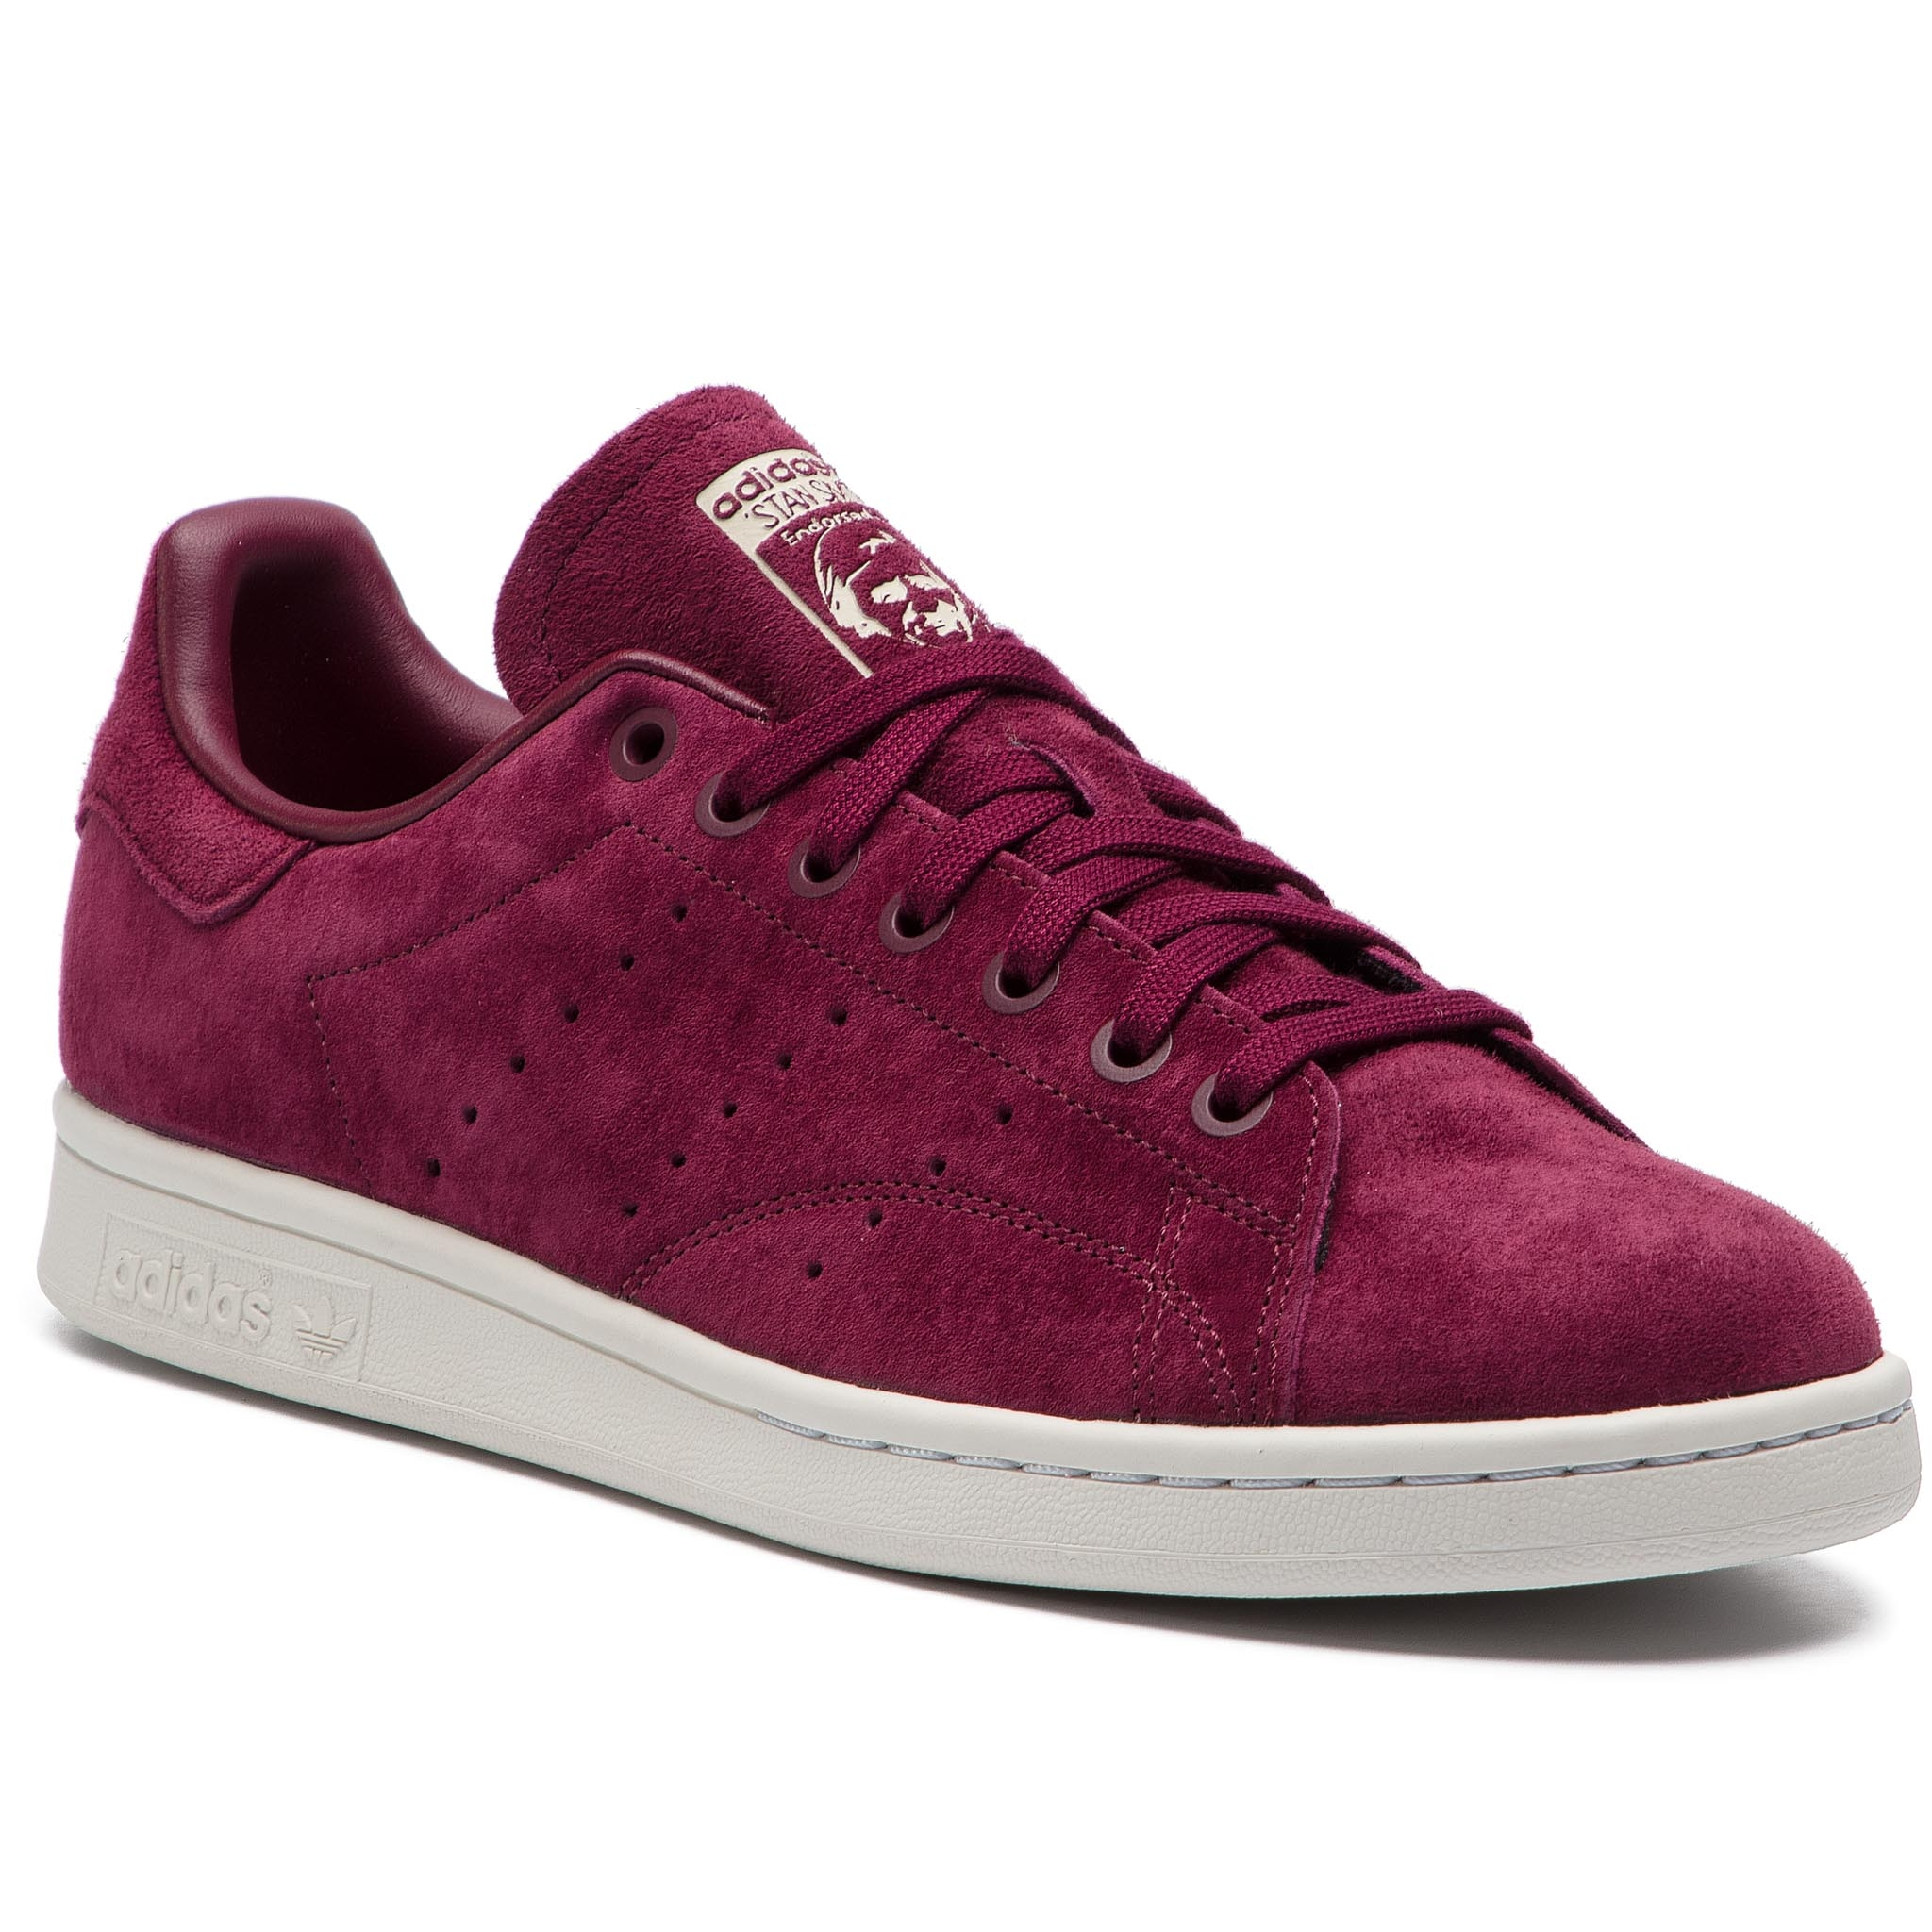 5c1fd962391 Shoes adidas - Stan Smith BZ0484 Rednit/Rednit/Cblack - Sneakers ...